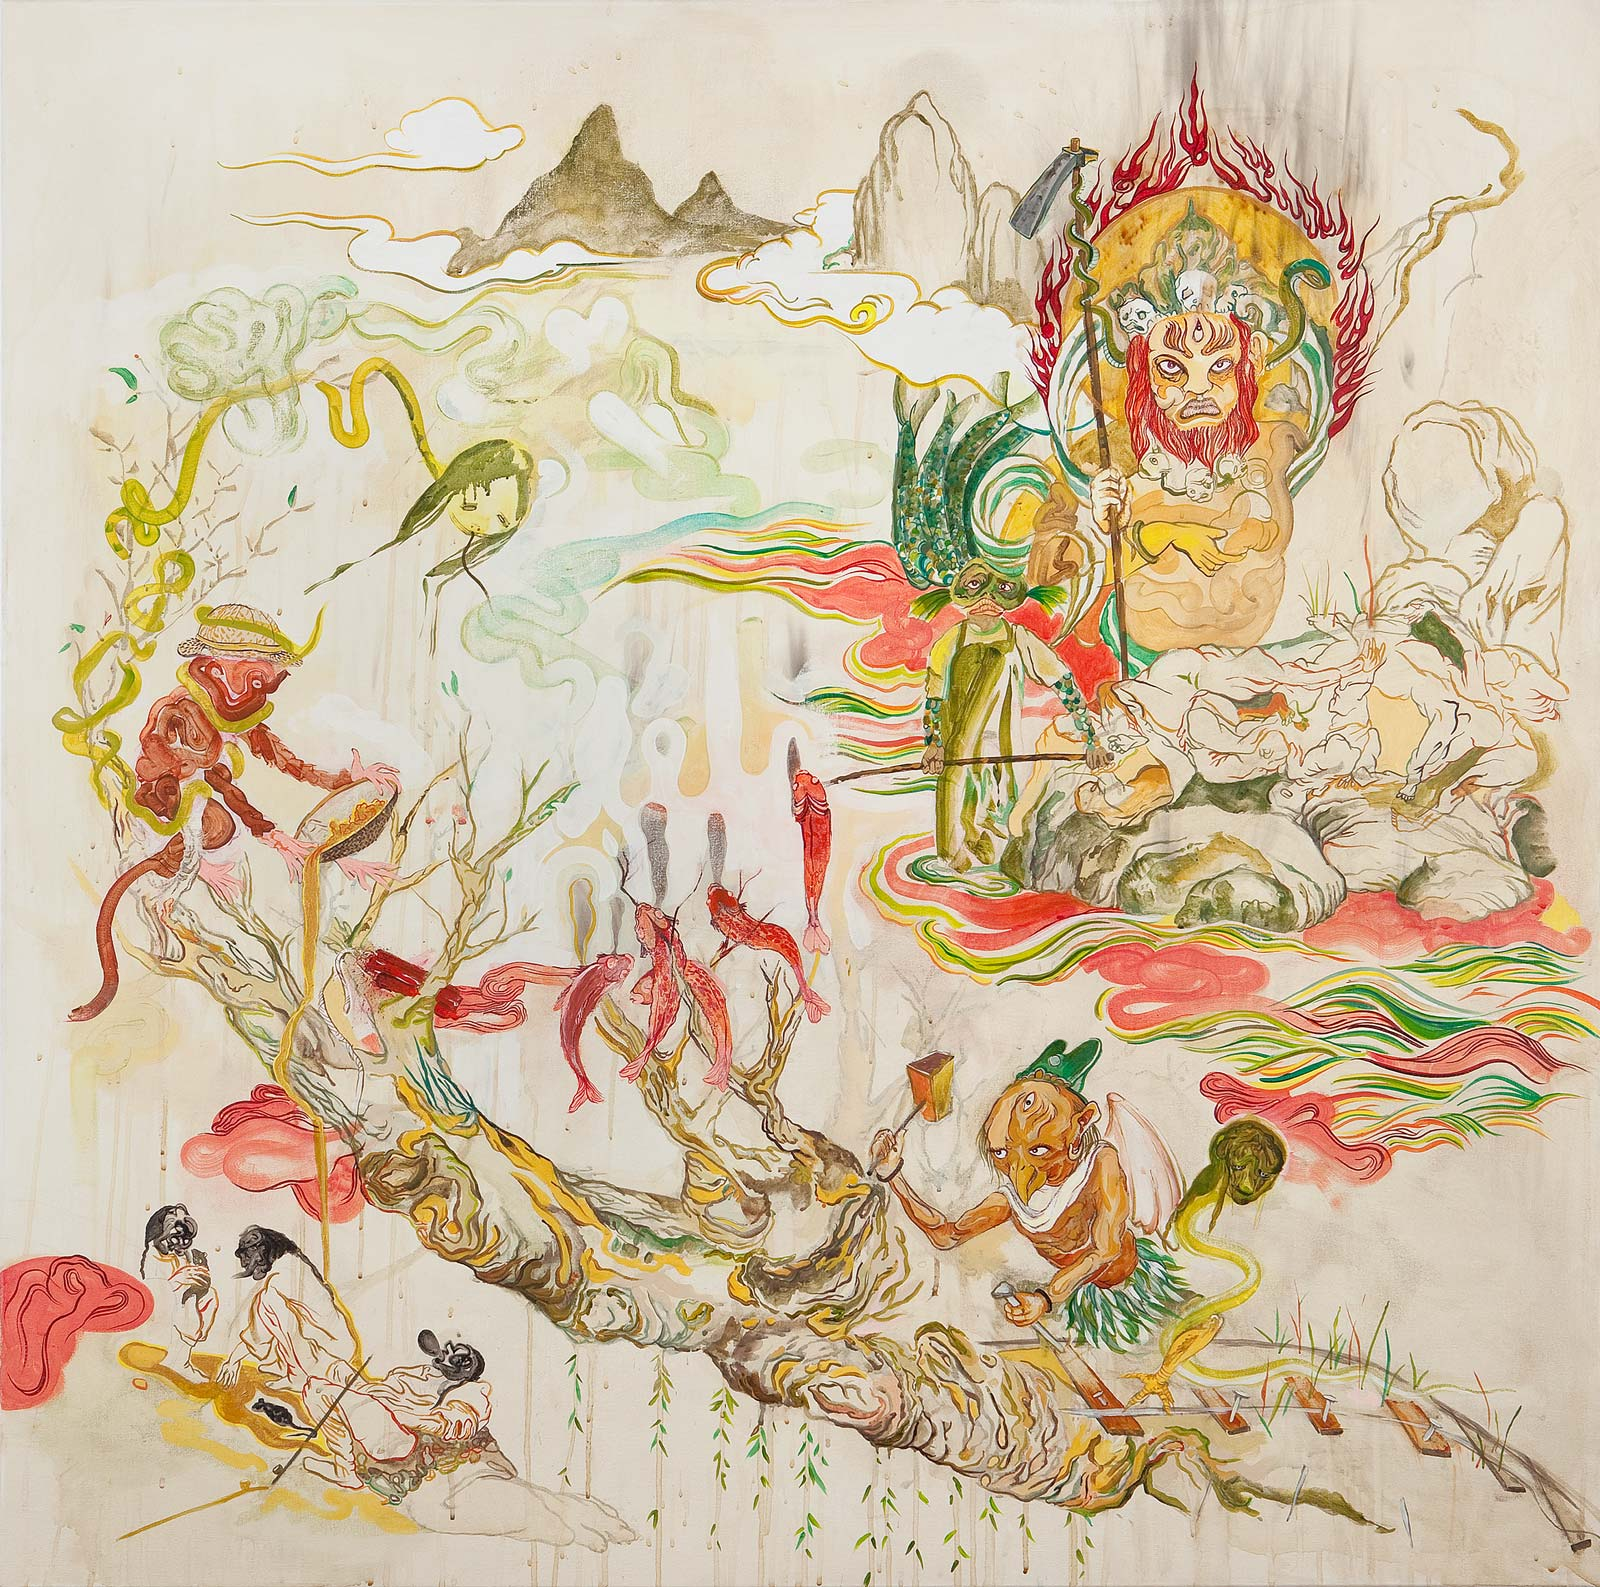 Howie Tsui 徐浩恩, Celestials of Gold Mountain 金山仙人, 2010, Acrylic on canvas 布面丙烯, 120 x 120 cm